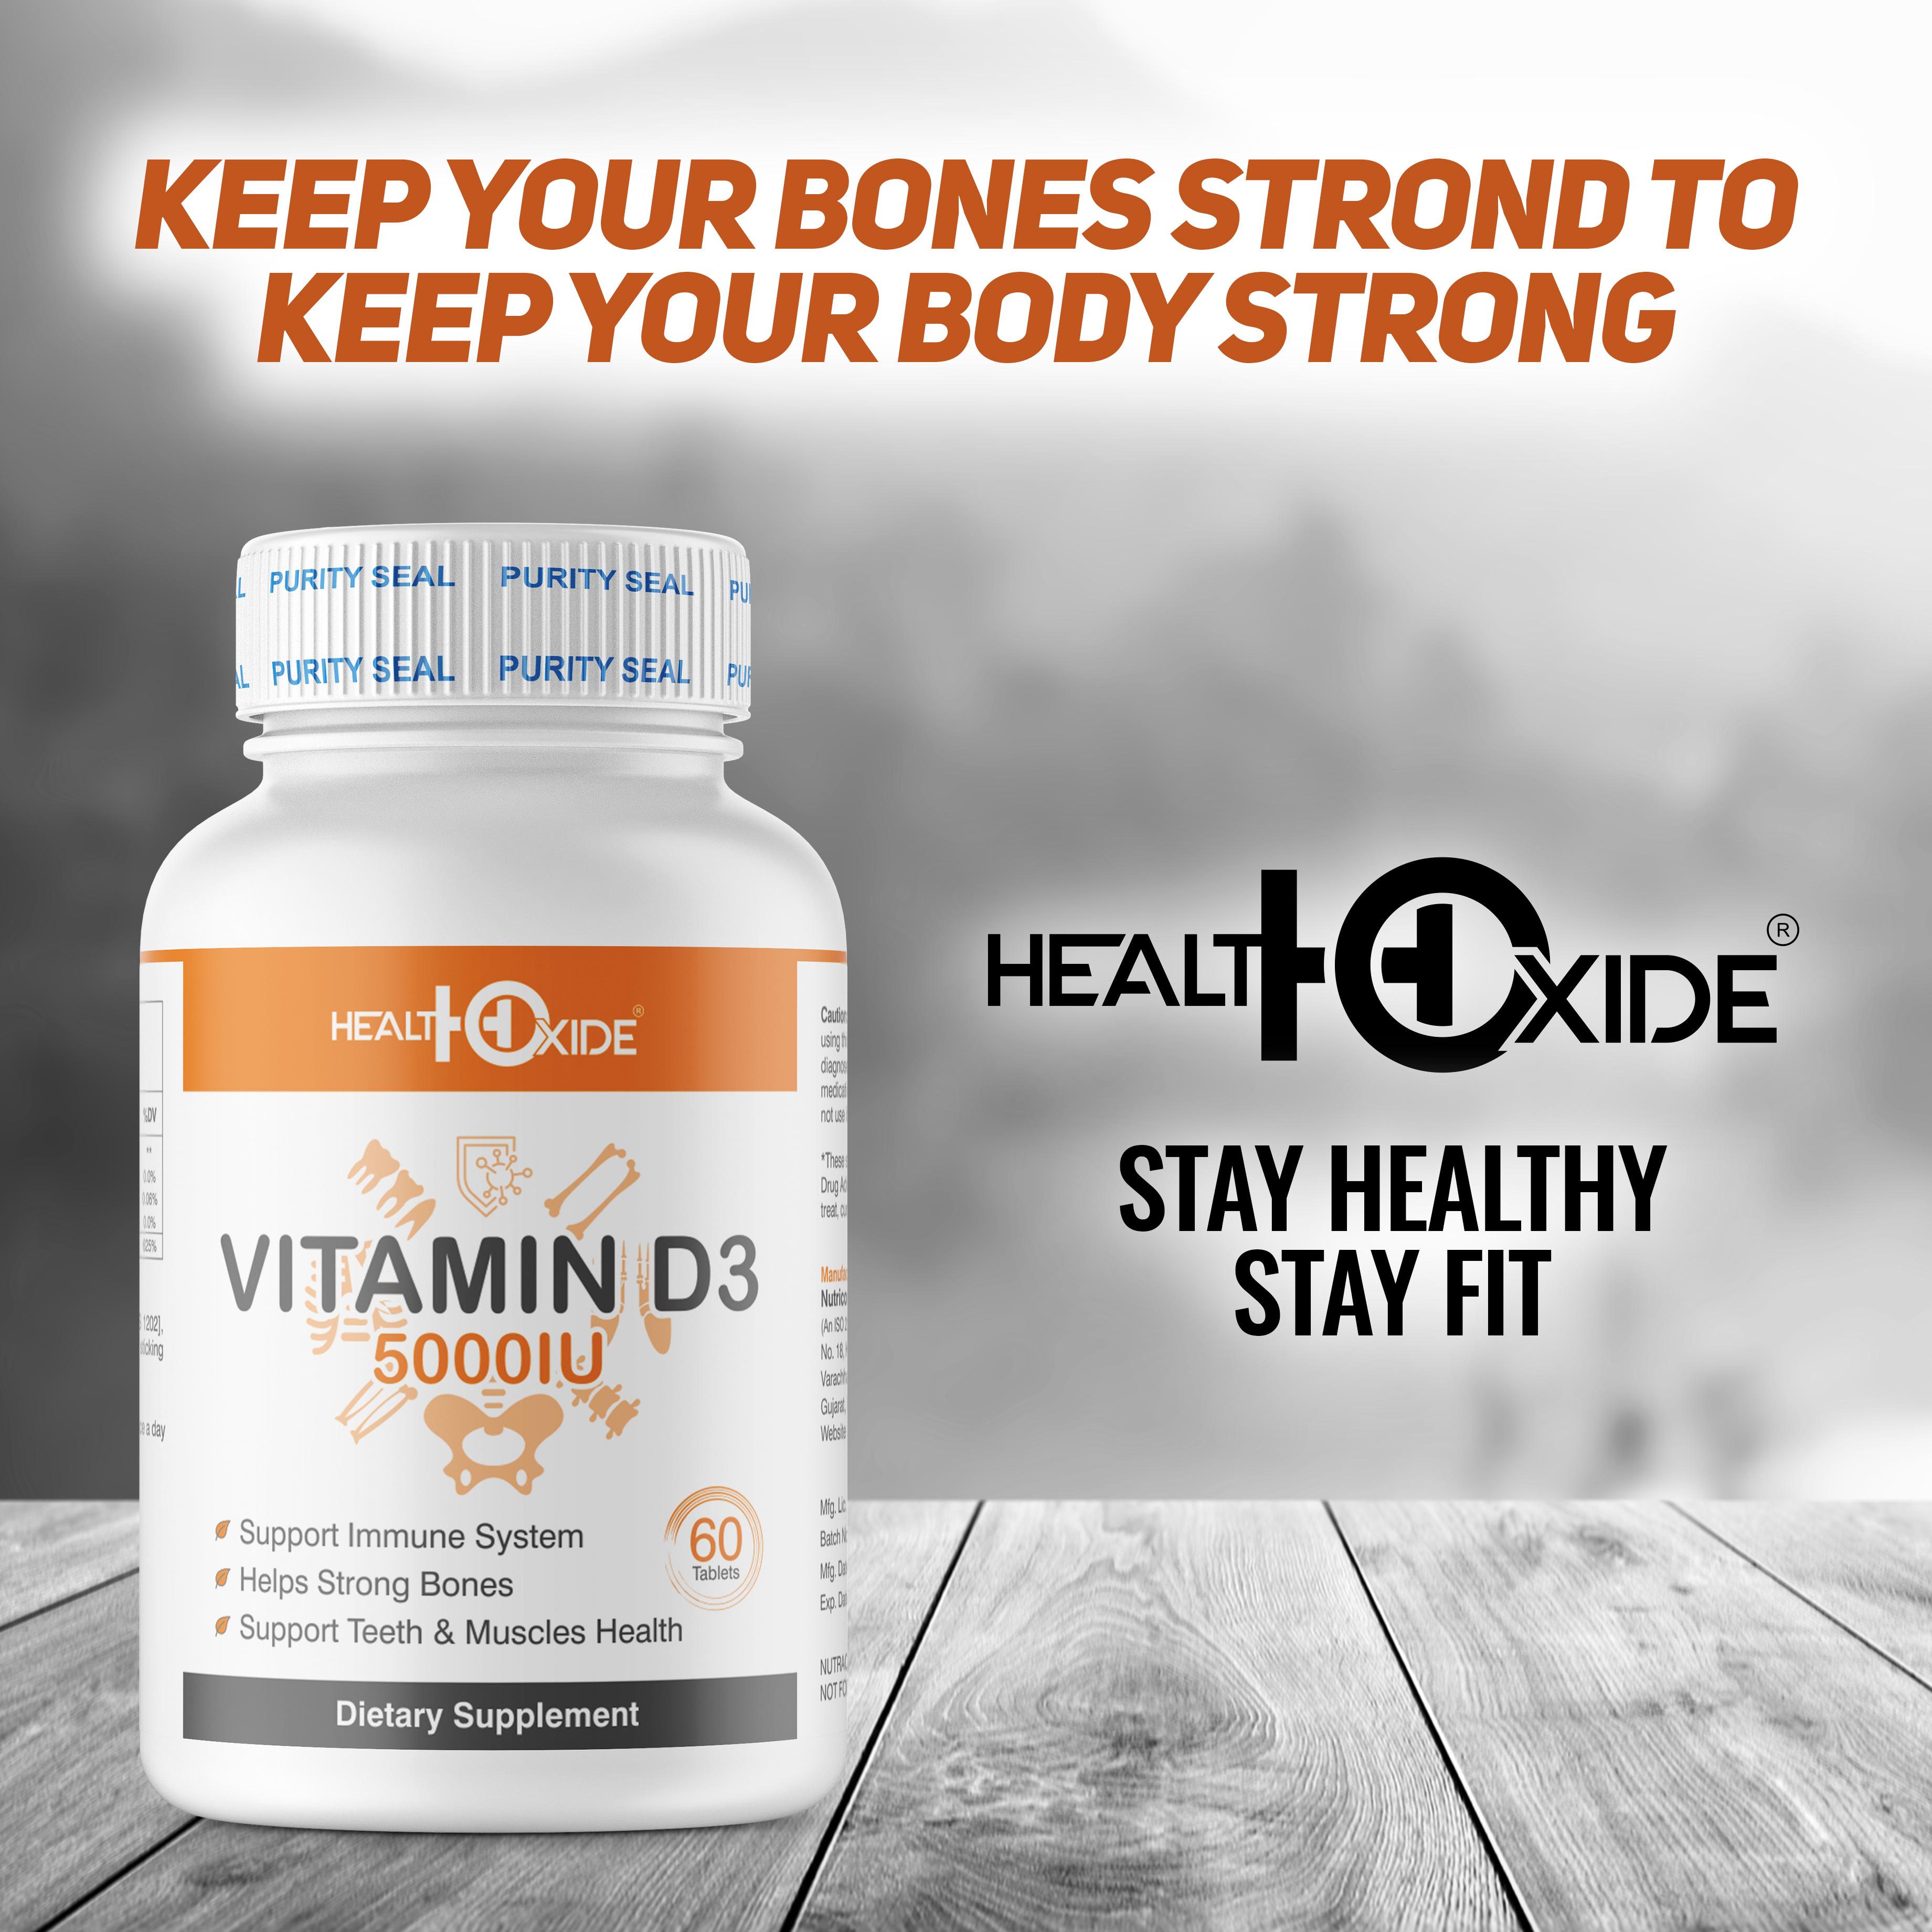 Vitamin D 3 5000 IU